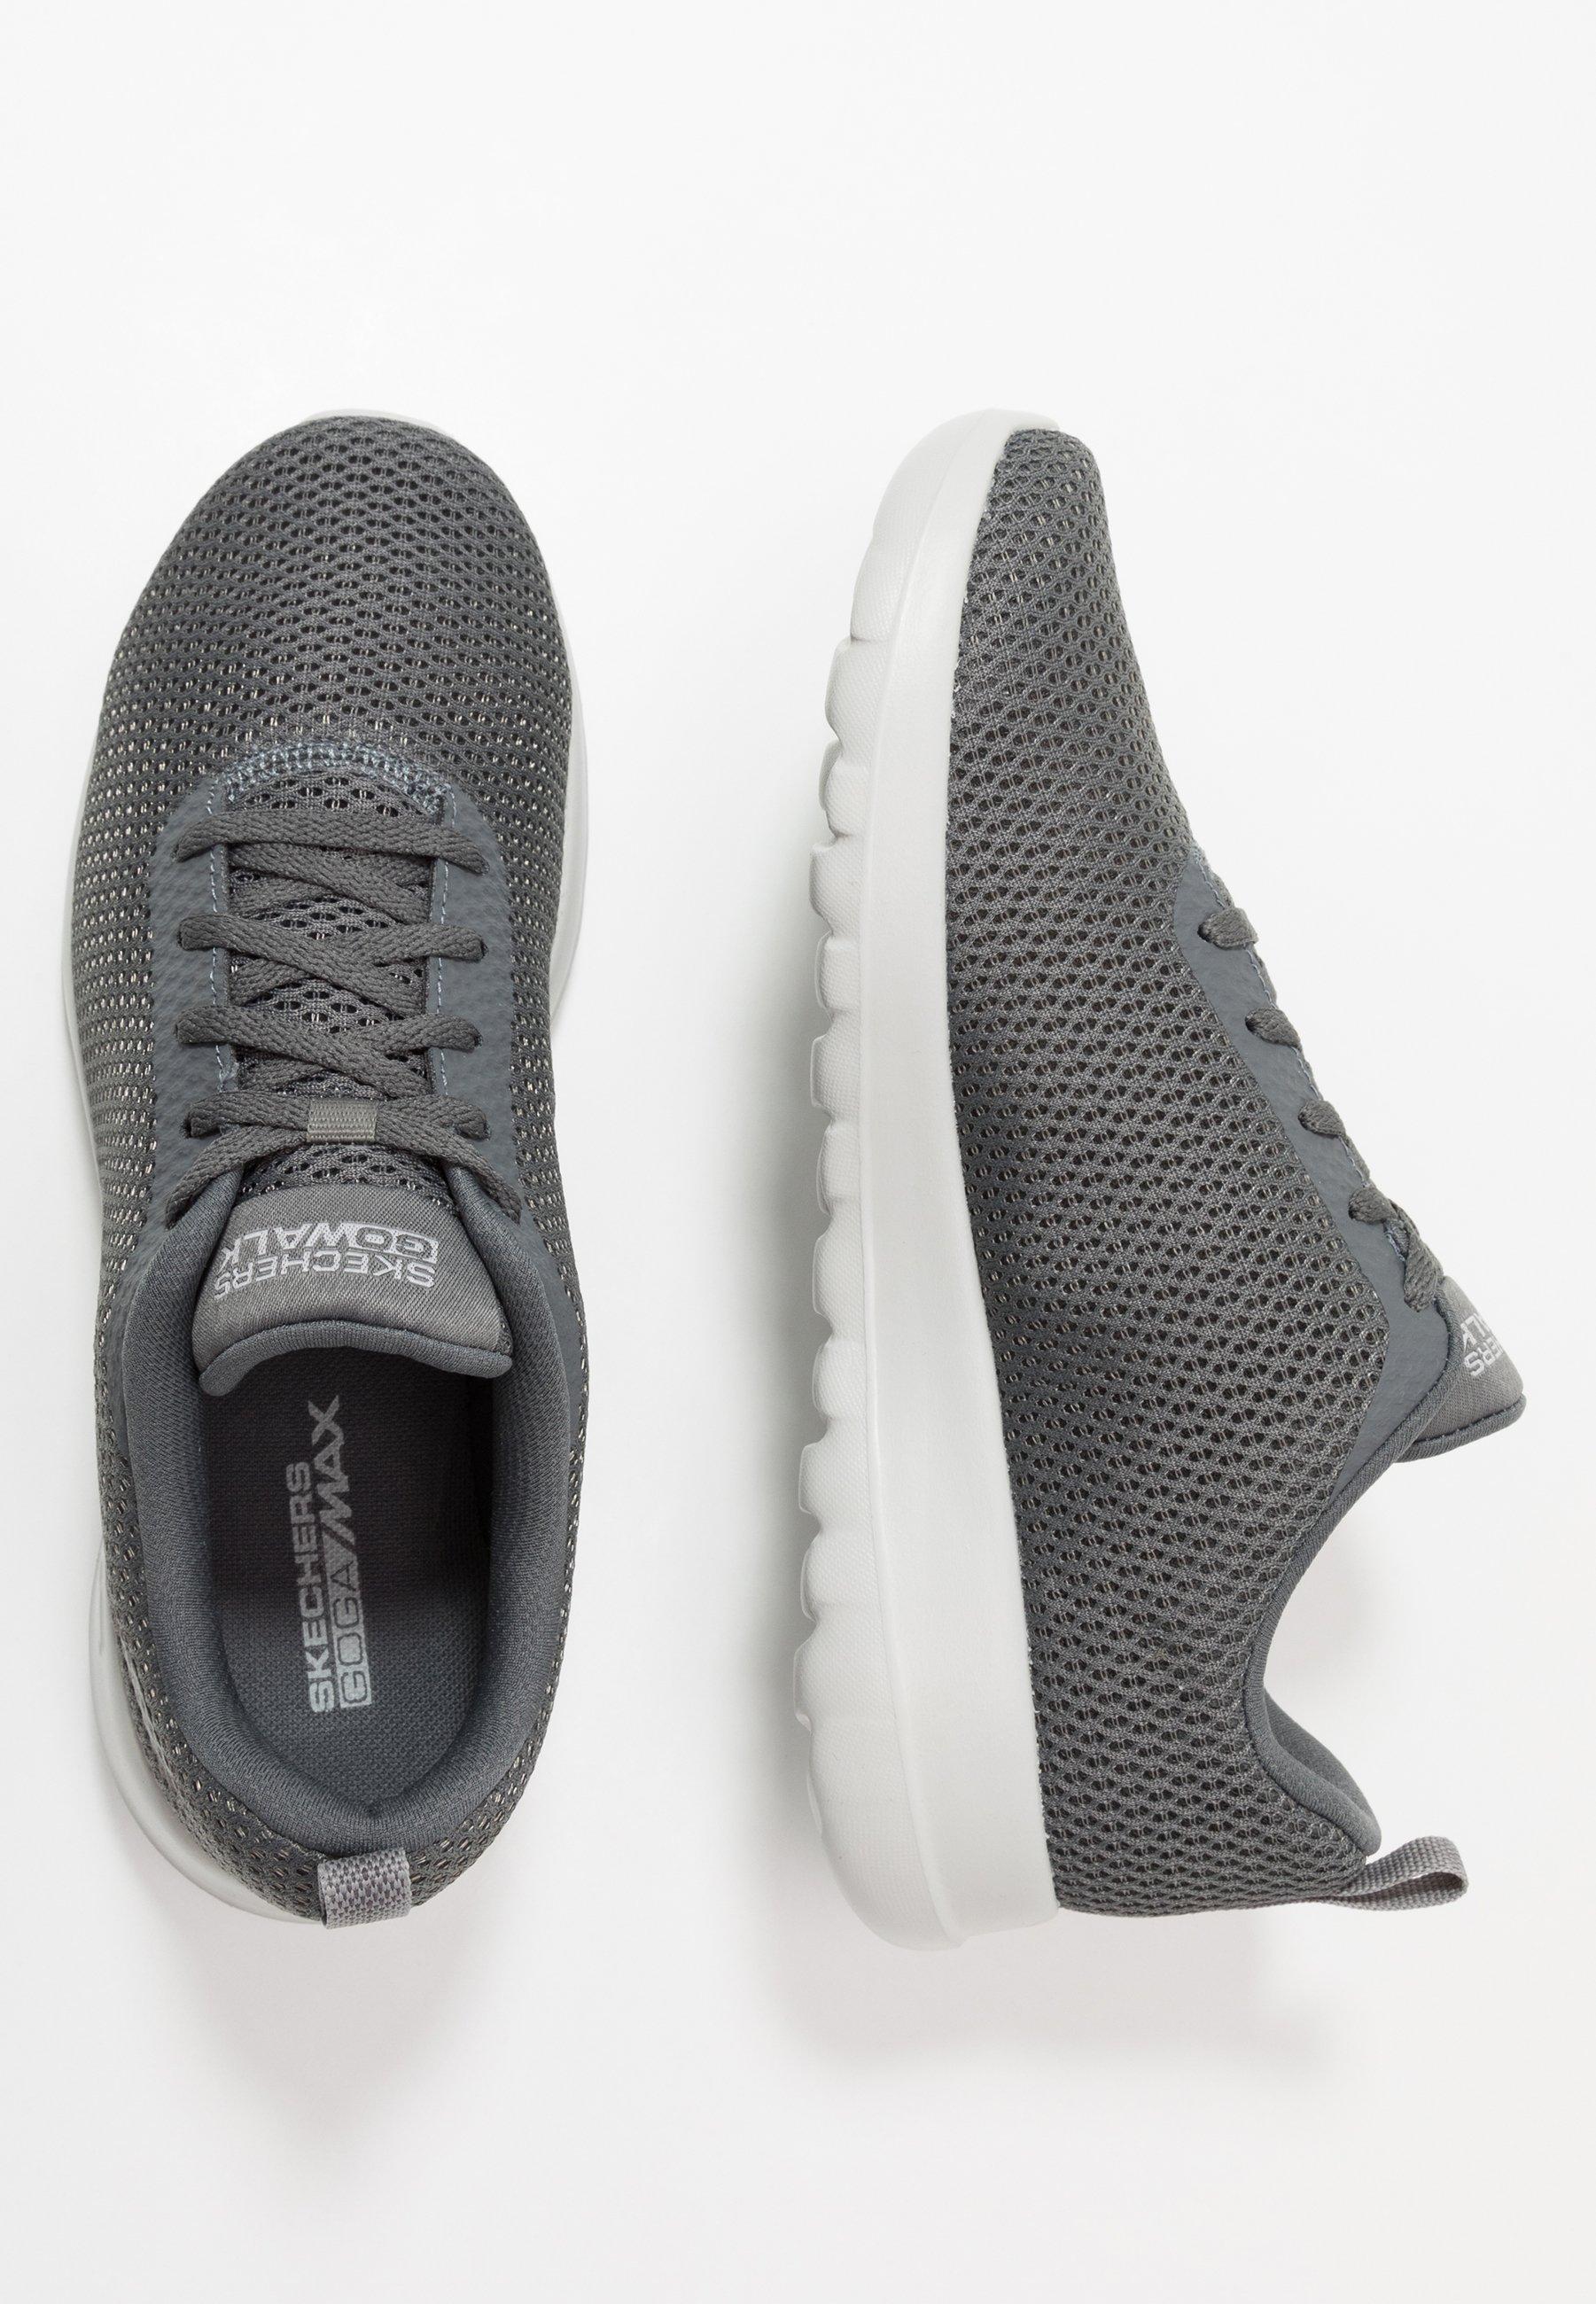 GO WALK JOY PARADISE Sportieve wandelschoenen charcoal